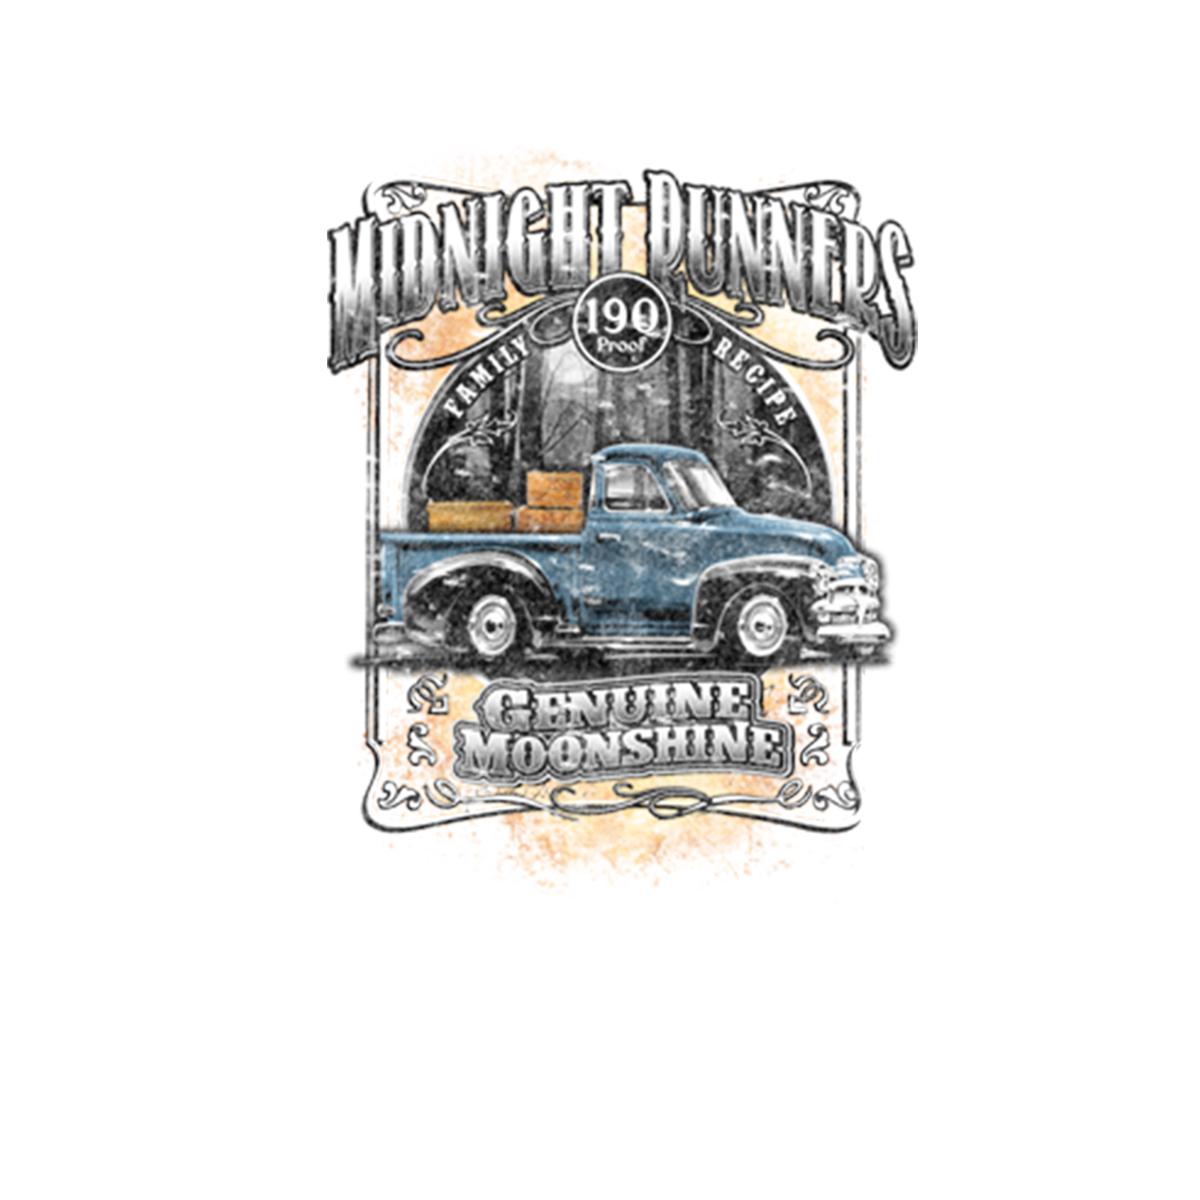 thumbnail 6 - Moonshine Midnight Runners Men T-shirt XS-5XL New